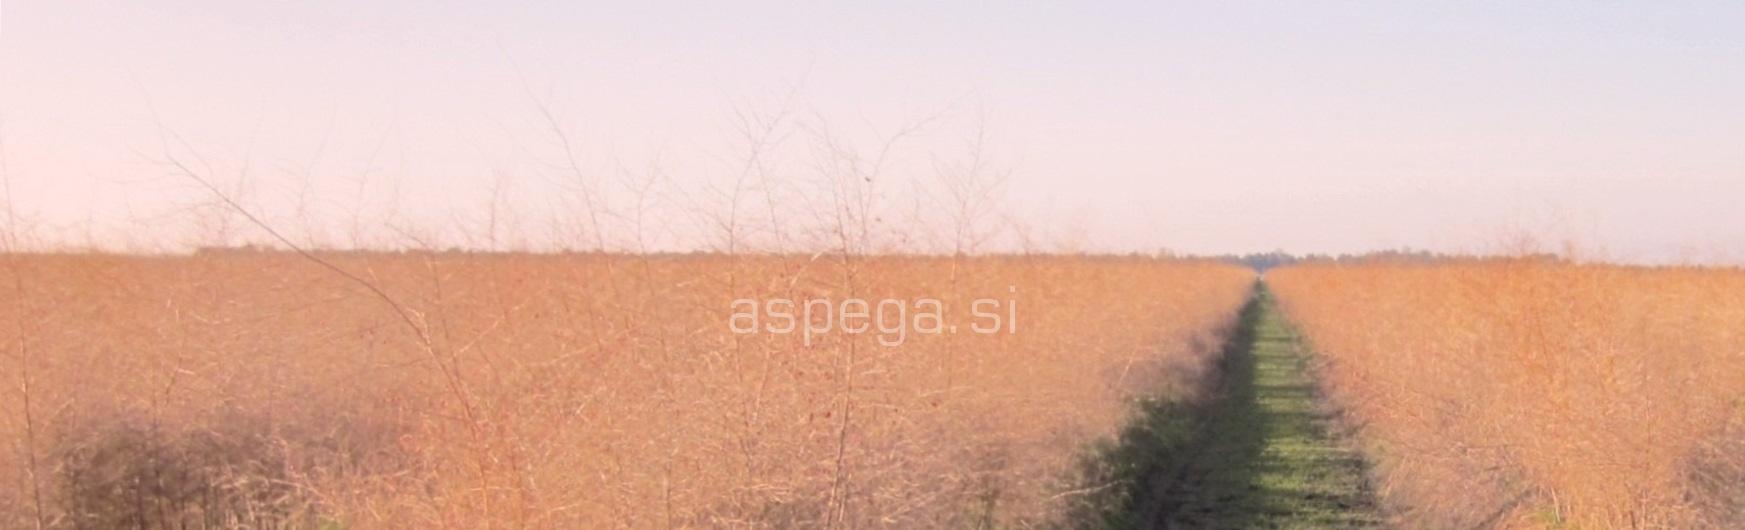 špargljev nasad jeseni